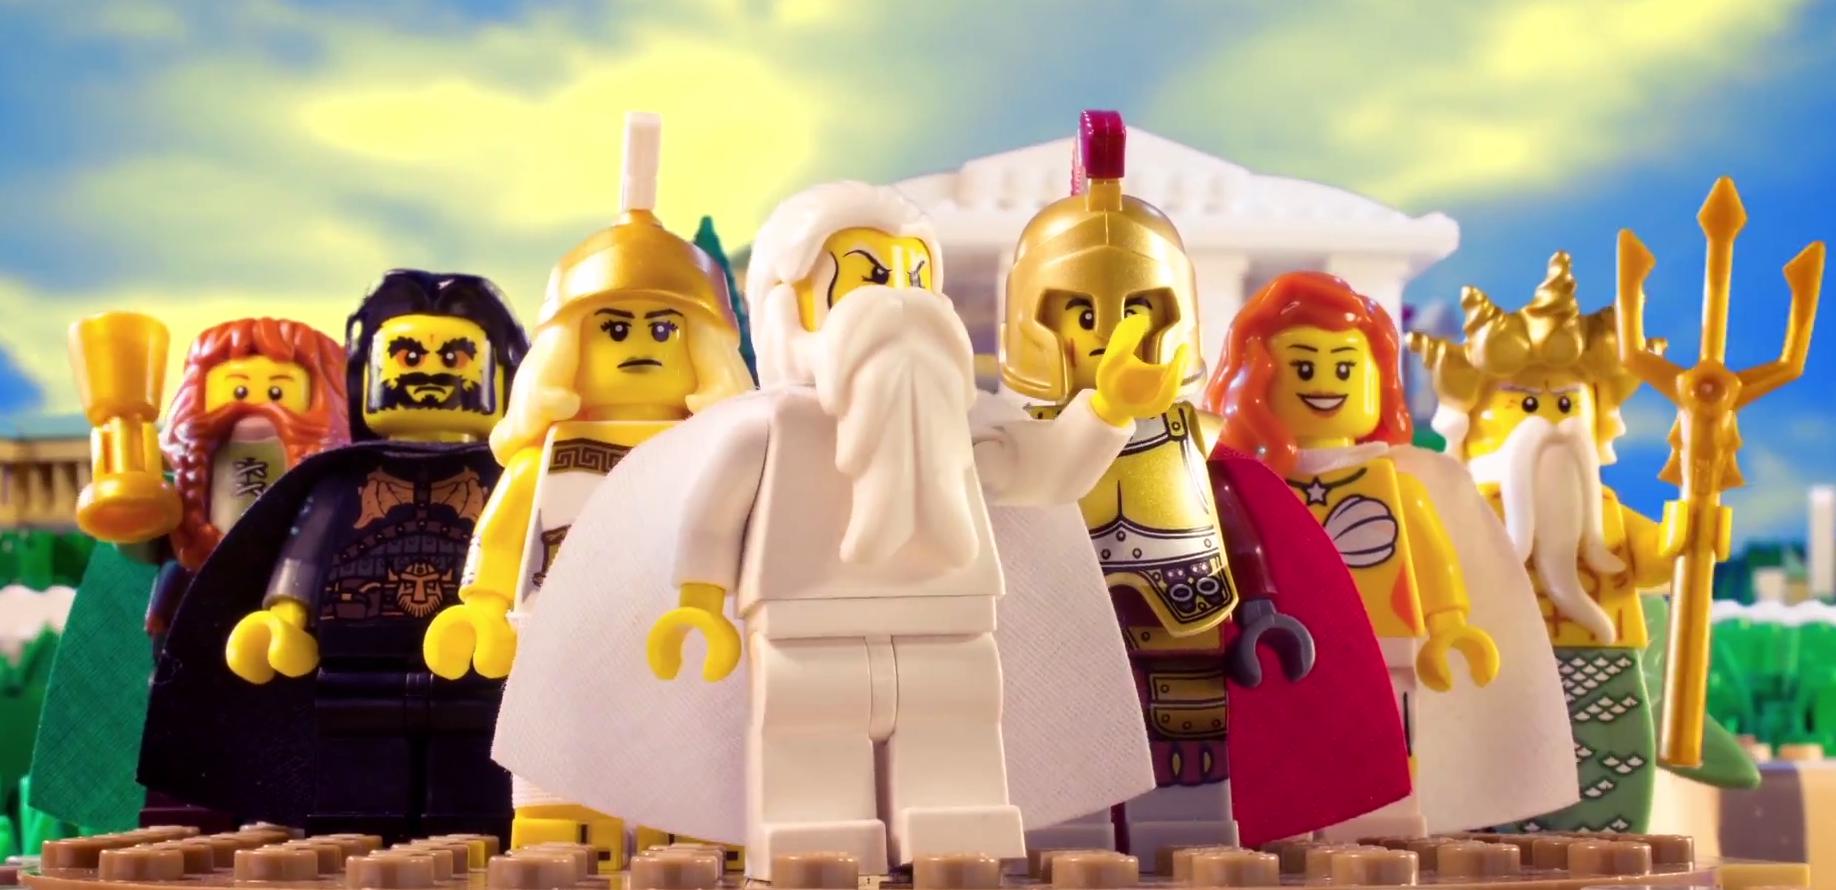 greek gods epic rap battles of history wiki fandom powered by wikia